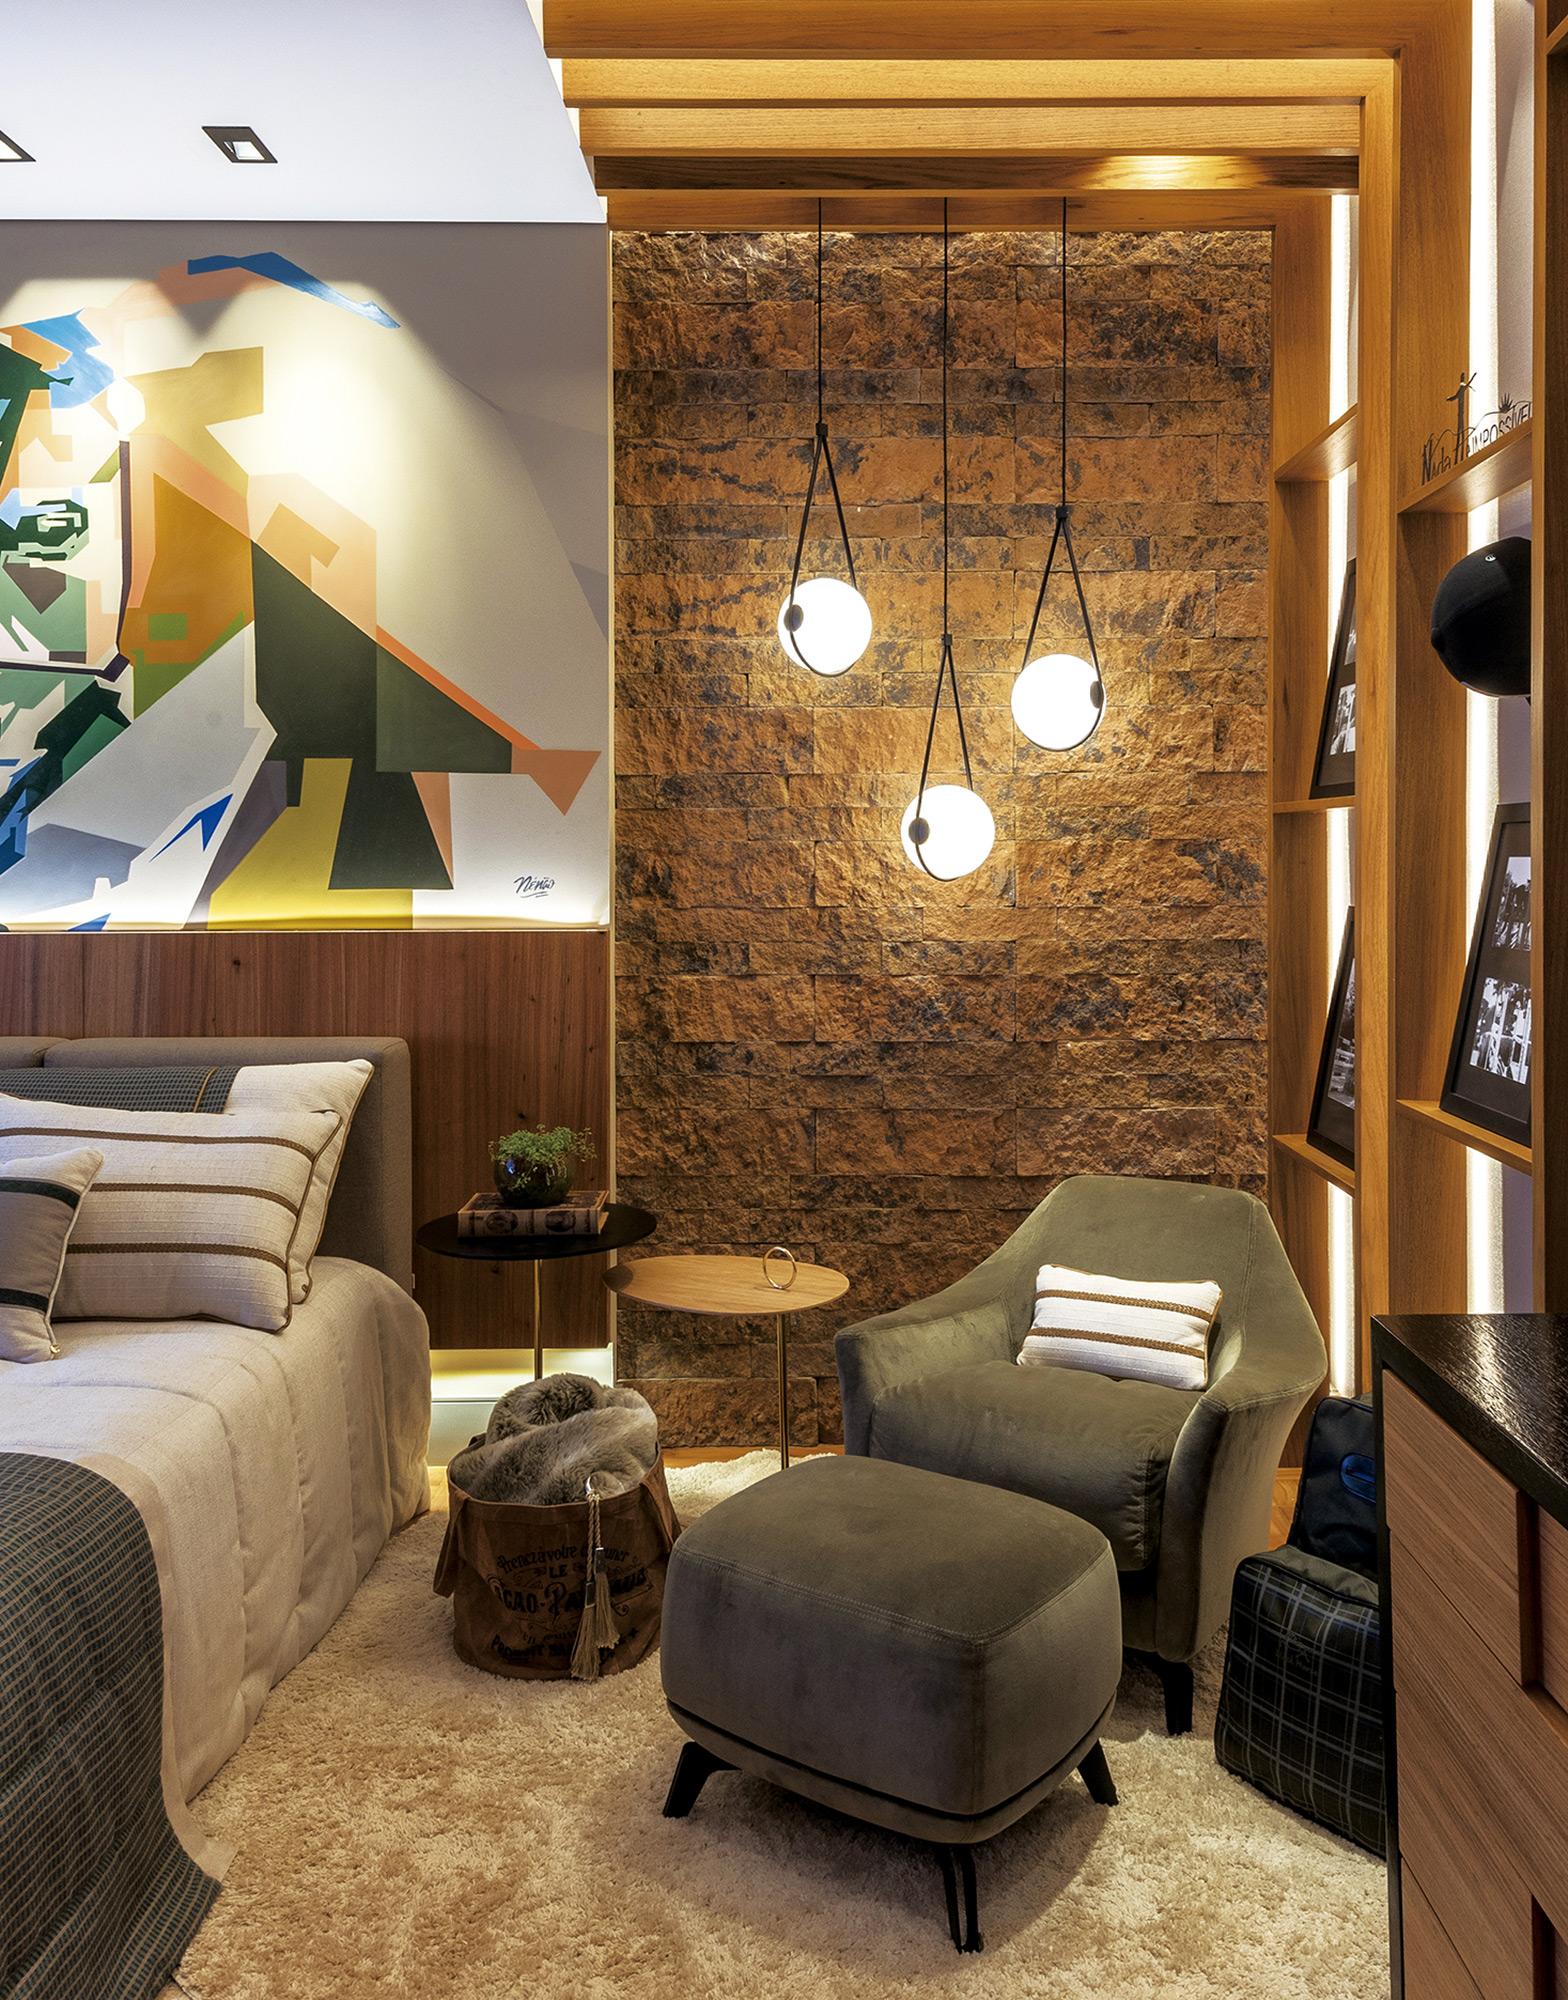 Ecobrick Stone Capuccino - Campinas Decor 2018 - Designers de Interiores Inara Petean e Ana de Castro - Foto Favaro Jr.